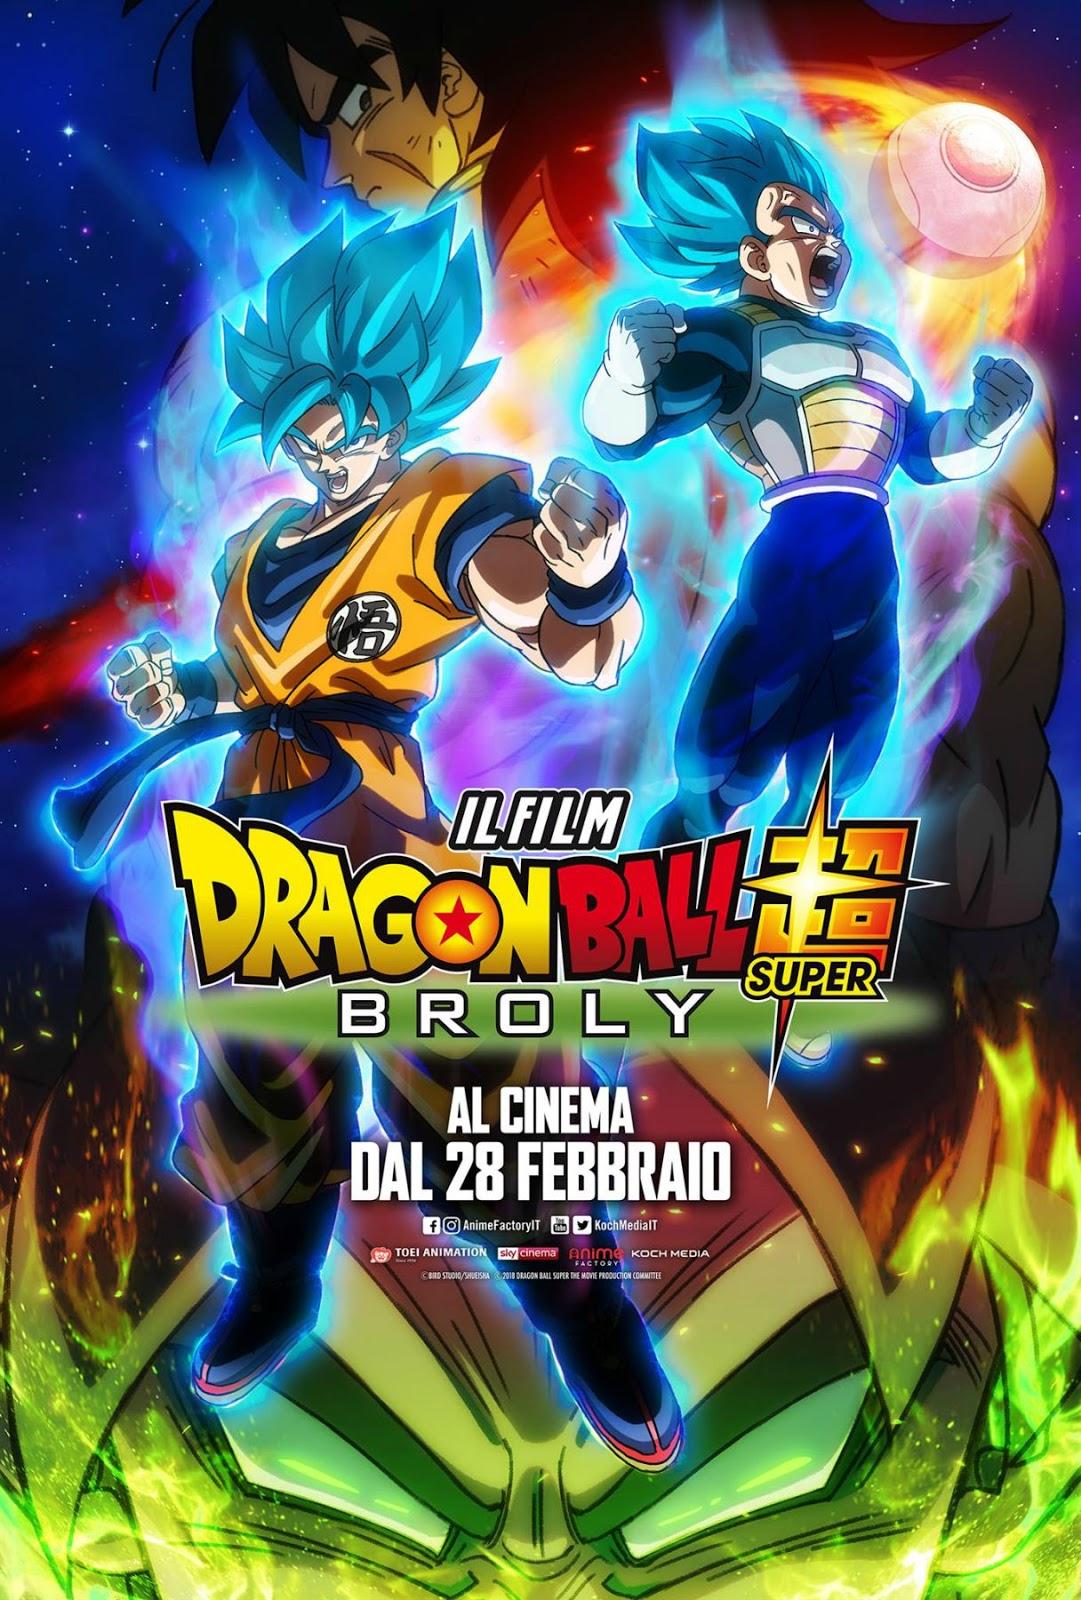 Raffaele Palazzo Dragon Ball Super Broly